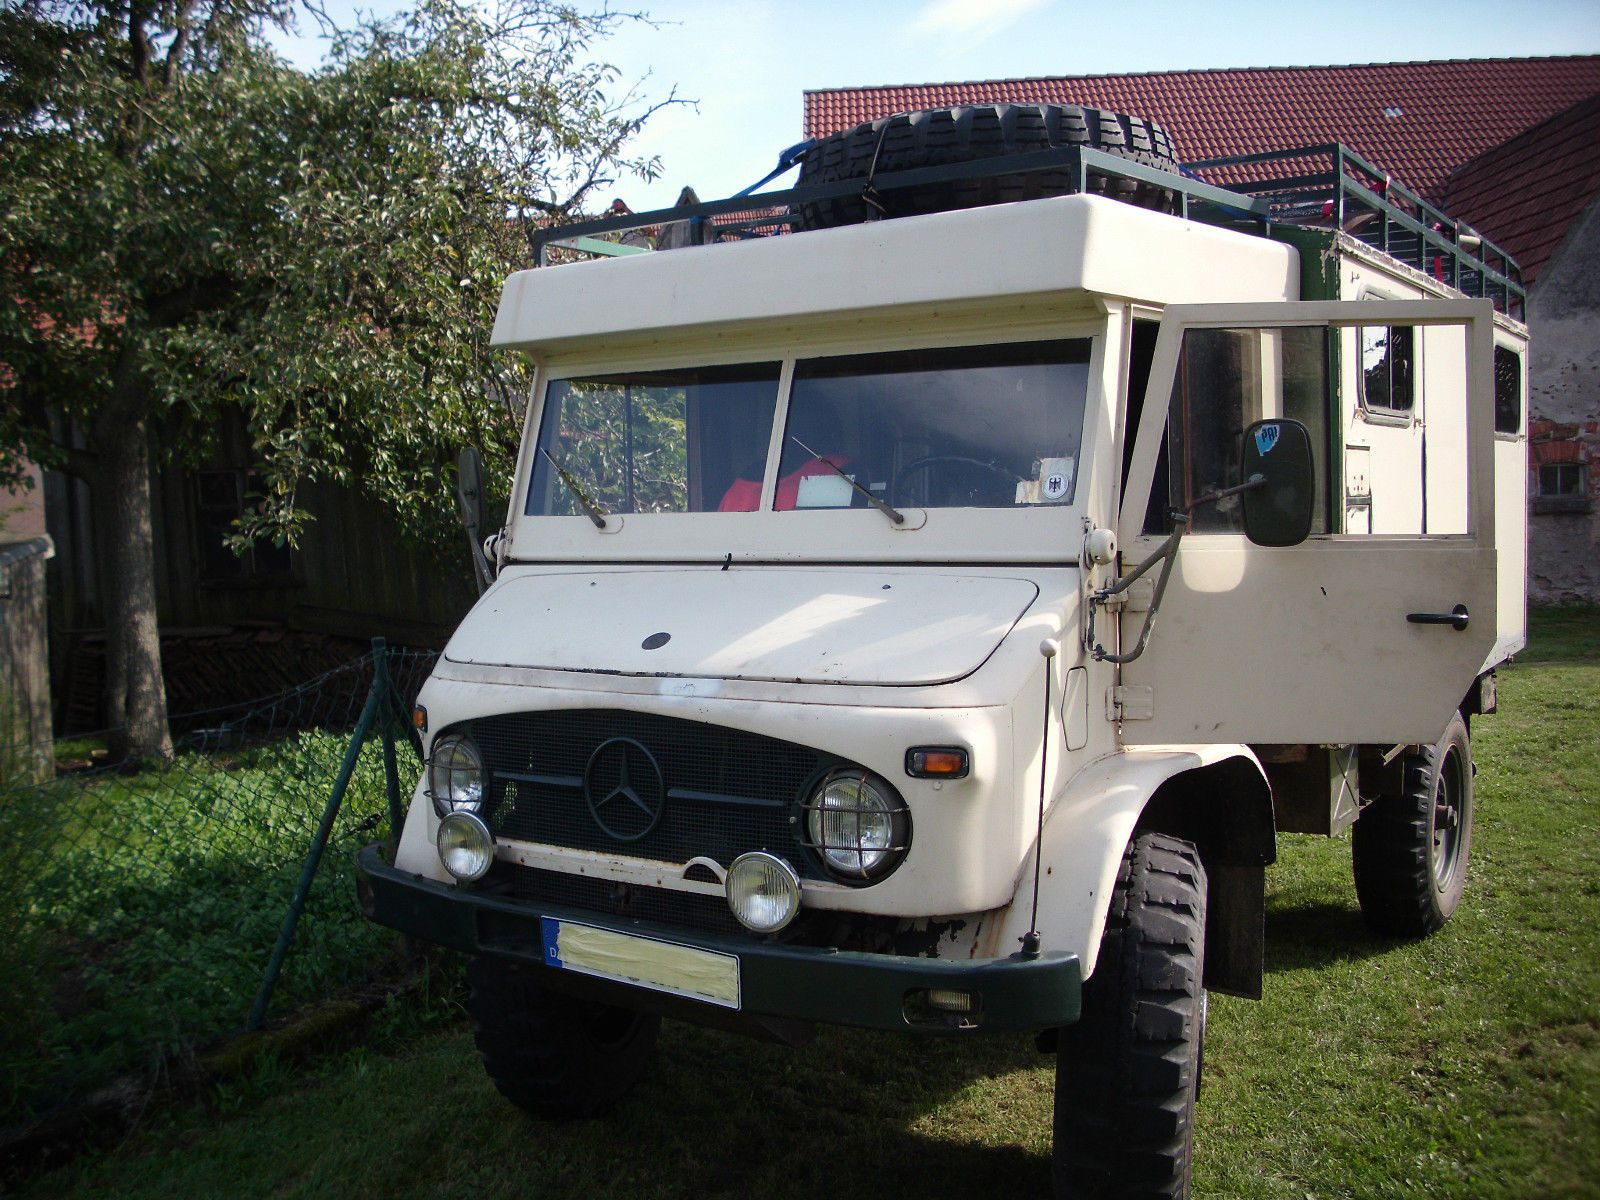 Unimog 404 Diesel Expeditionsmobil Ebay Unimog Adventure